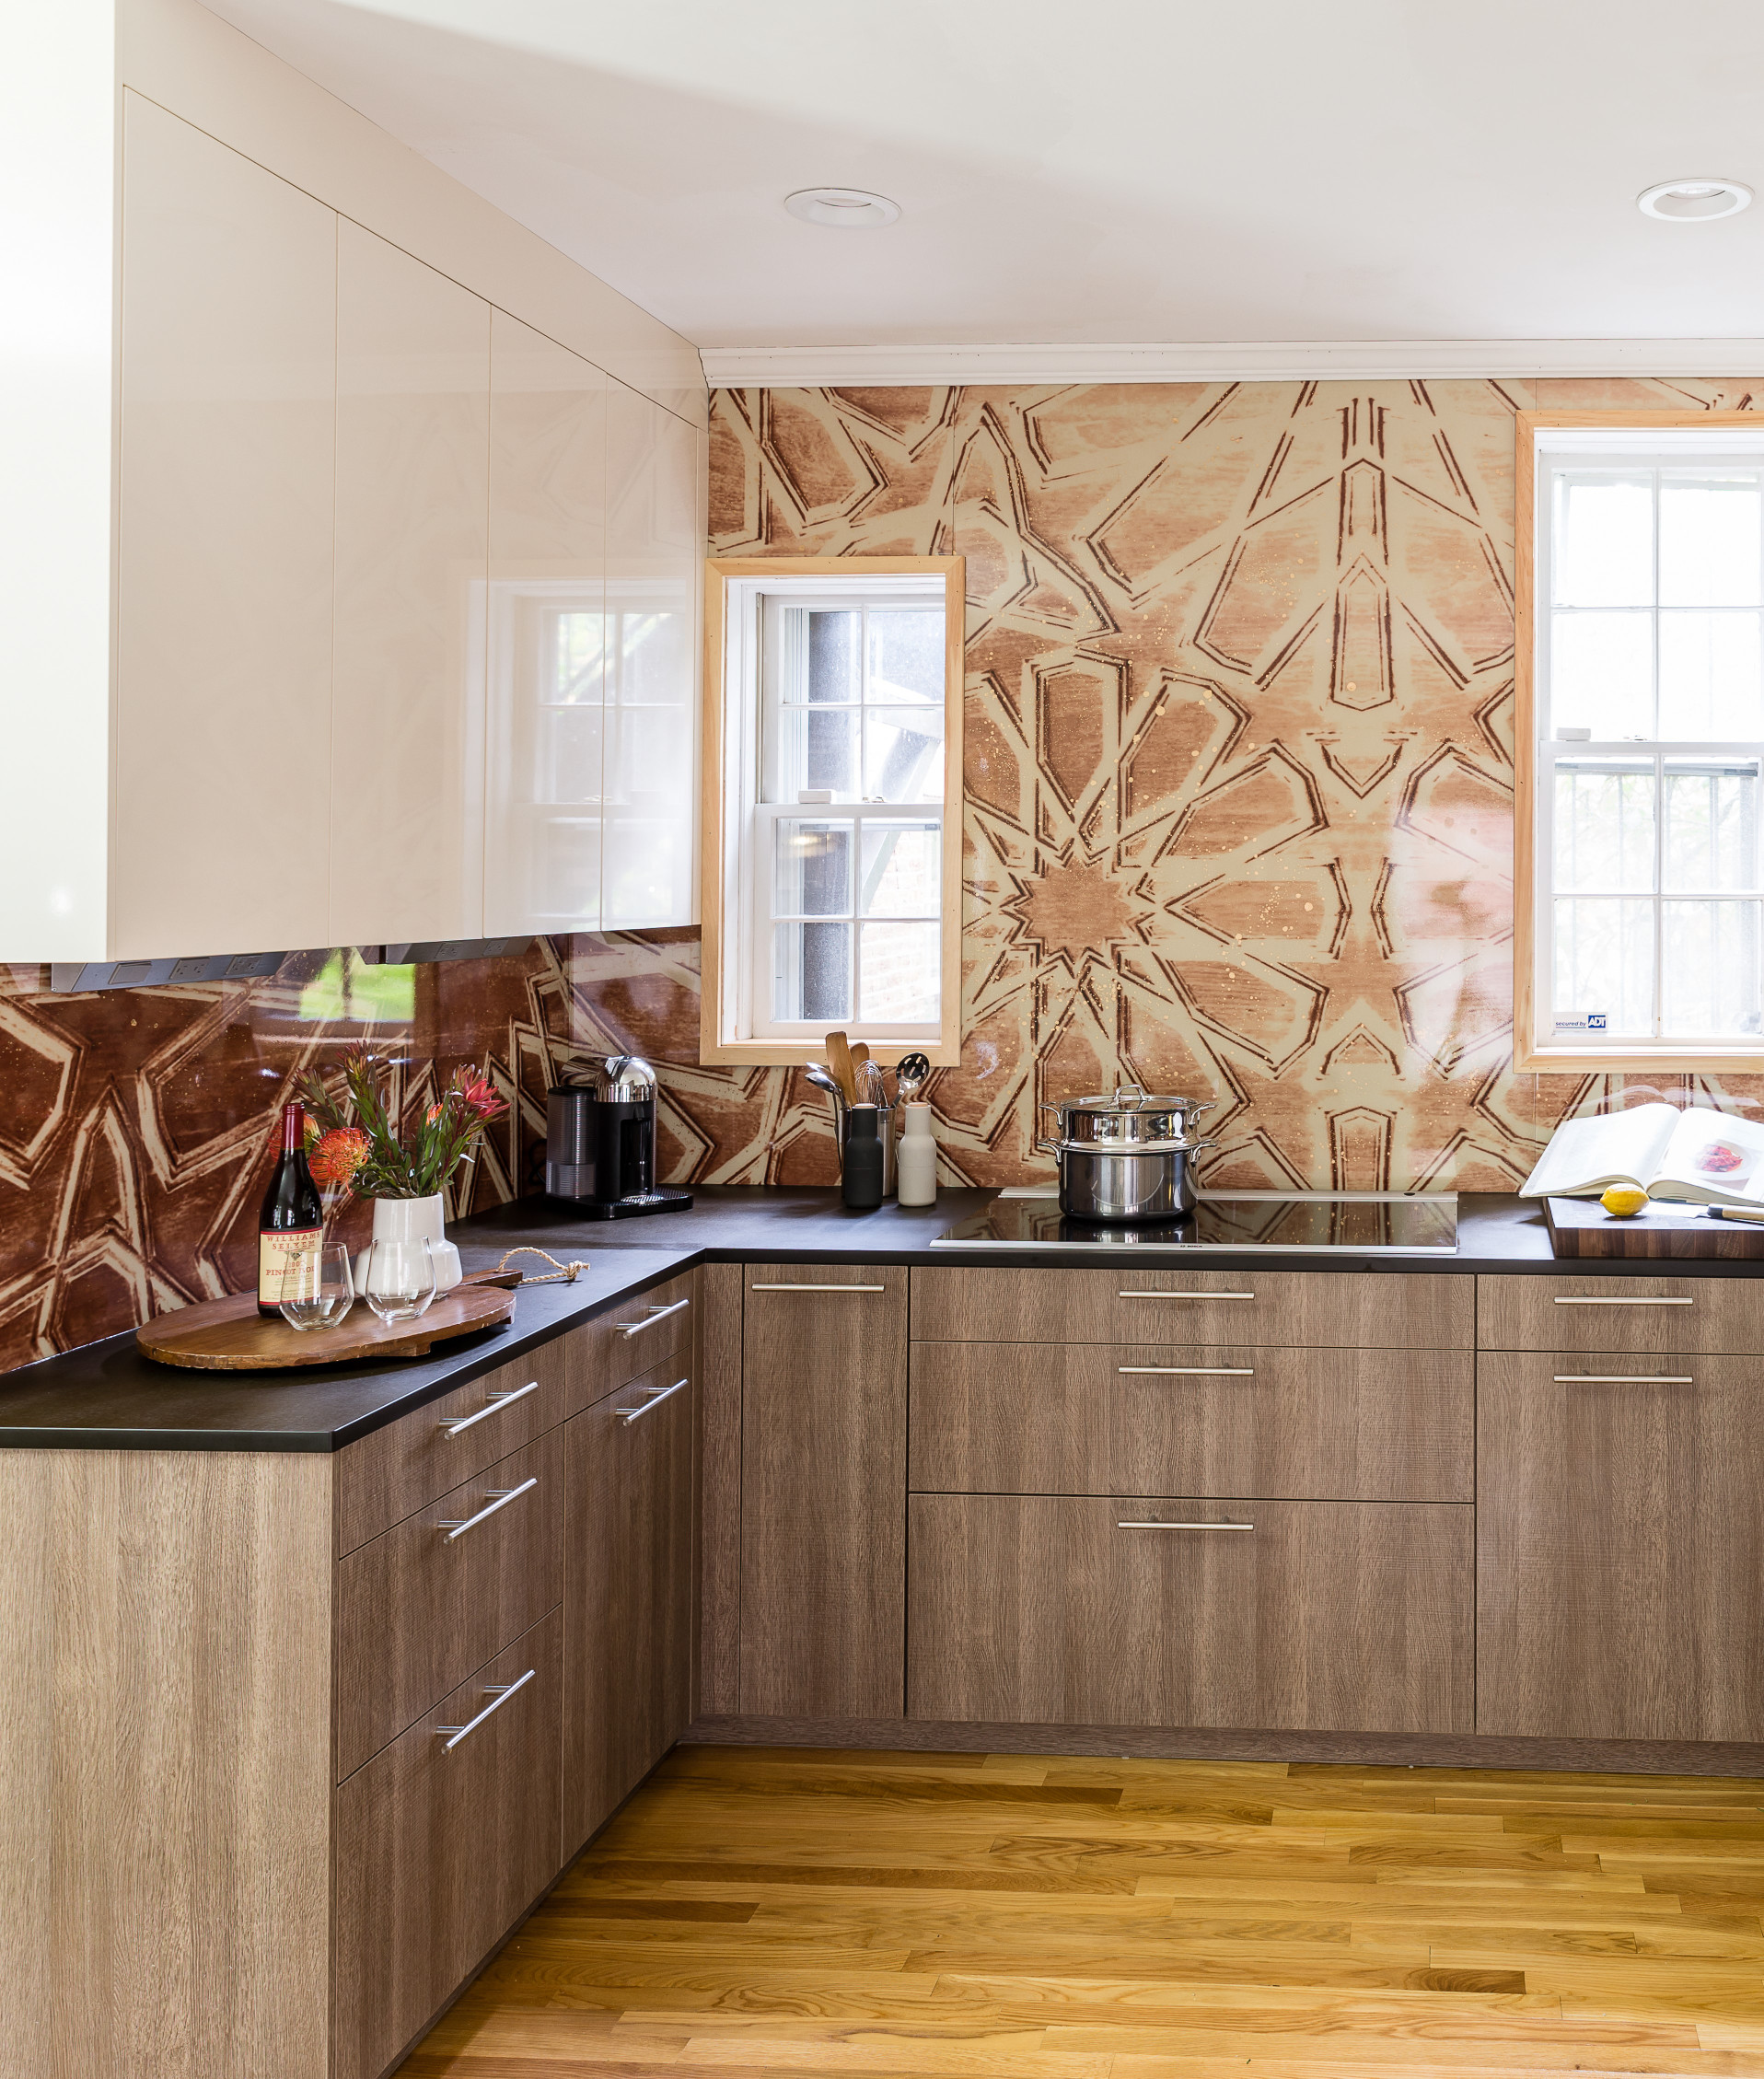 Moroccan style backsplash with oak veneer leicht cabinets in a modern kitchen. Wolf appliances, and a column wine fridge.